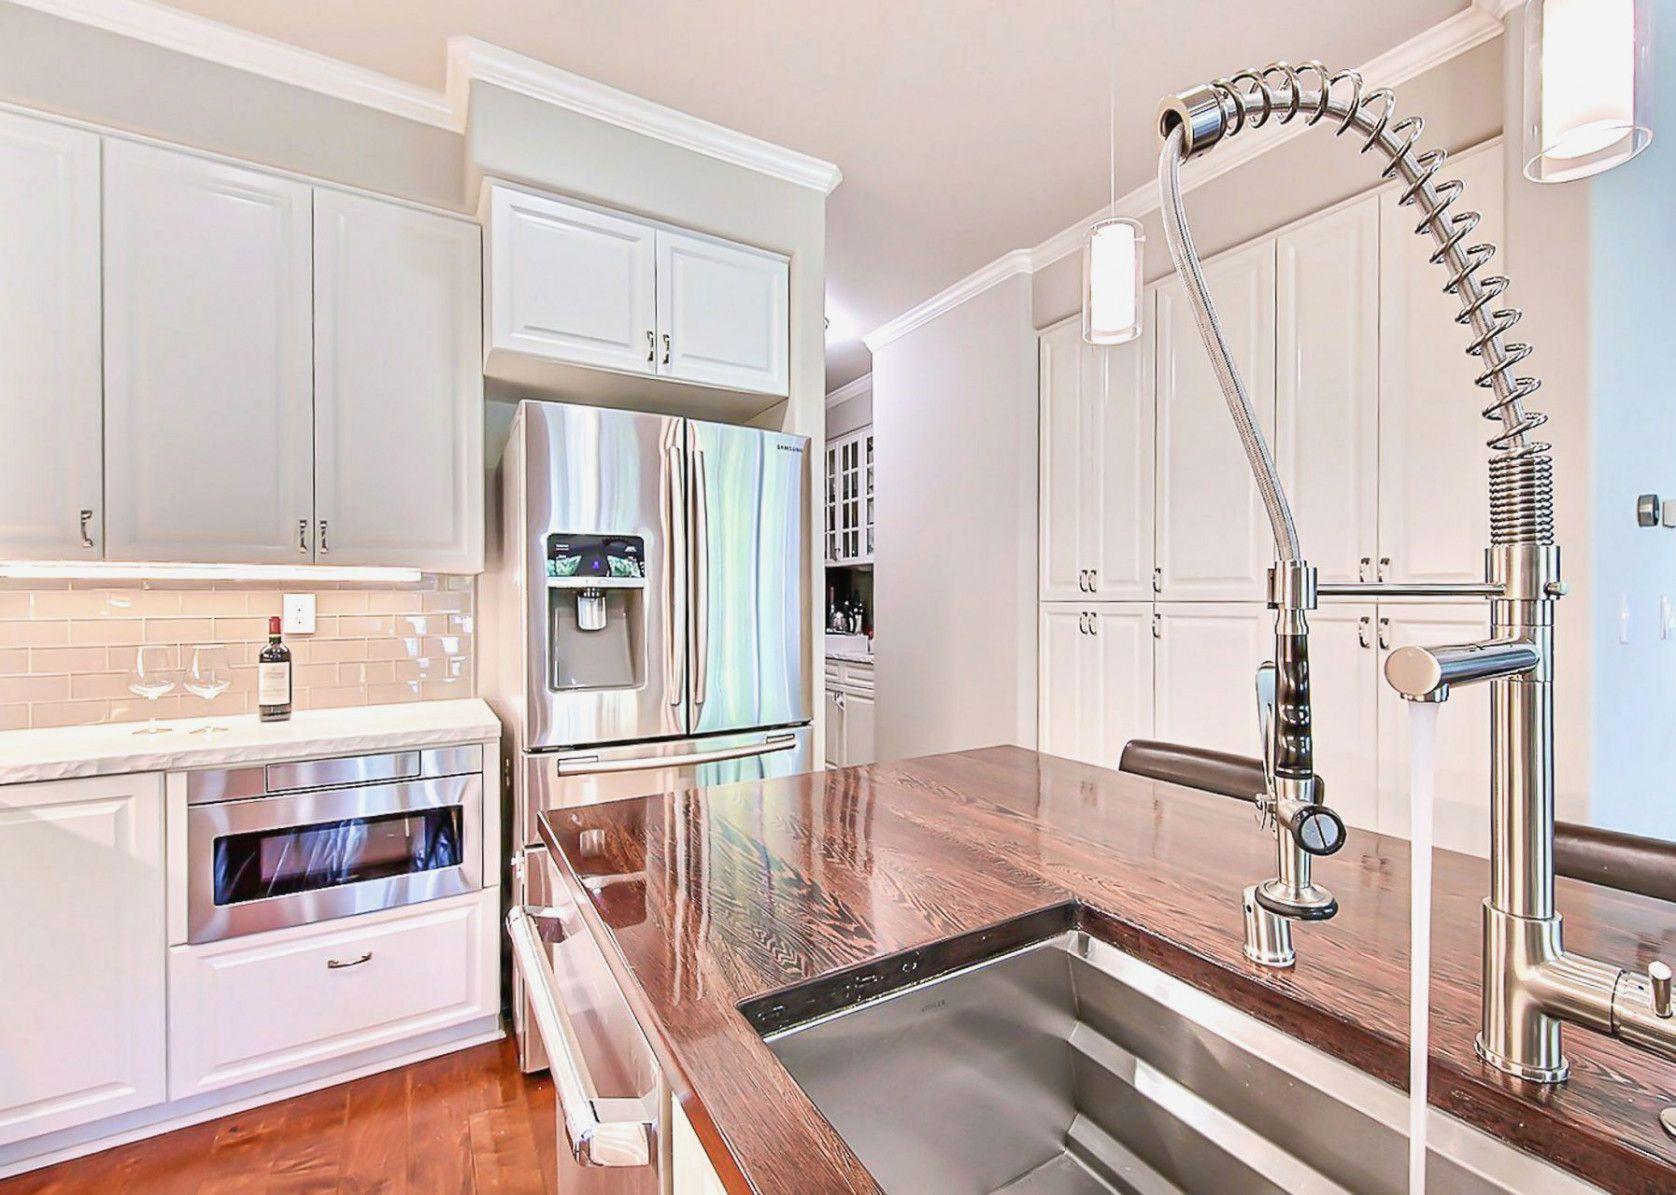 50+ Kitchen Cabinets Concord Ca - Backsplash for Kitchen Ideas Check ...